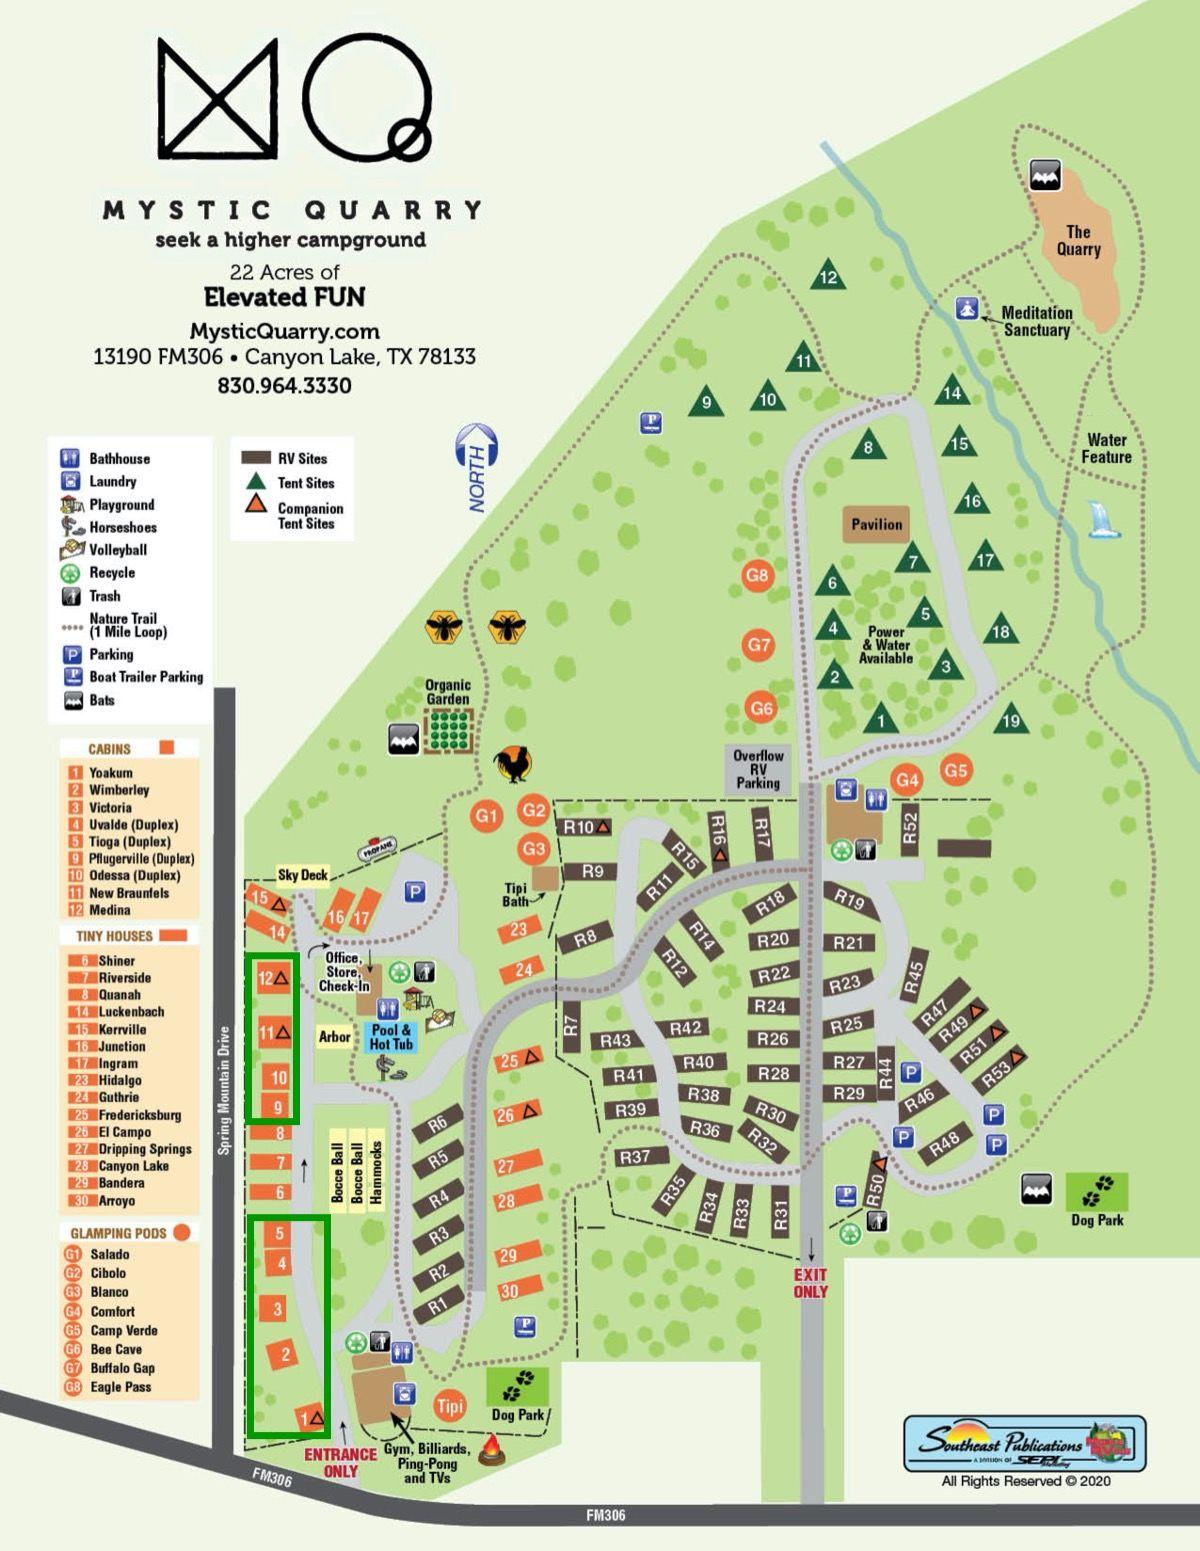 Map Mods for Website - cabins.jpg